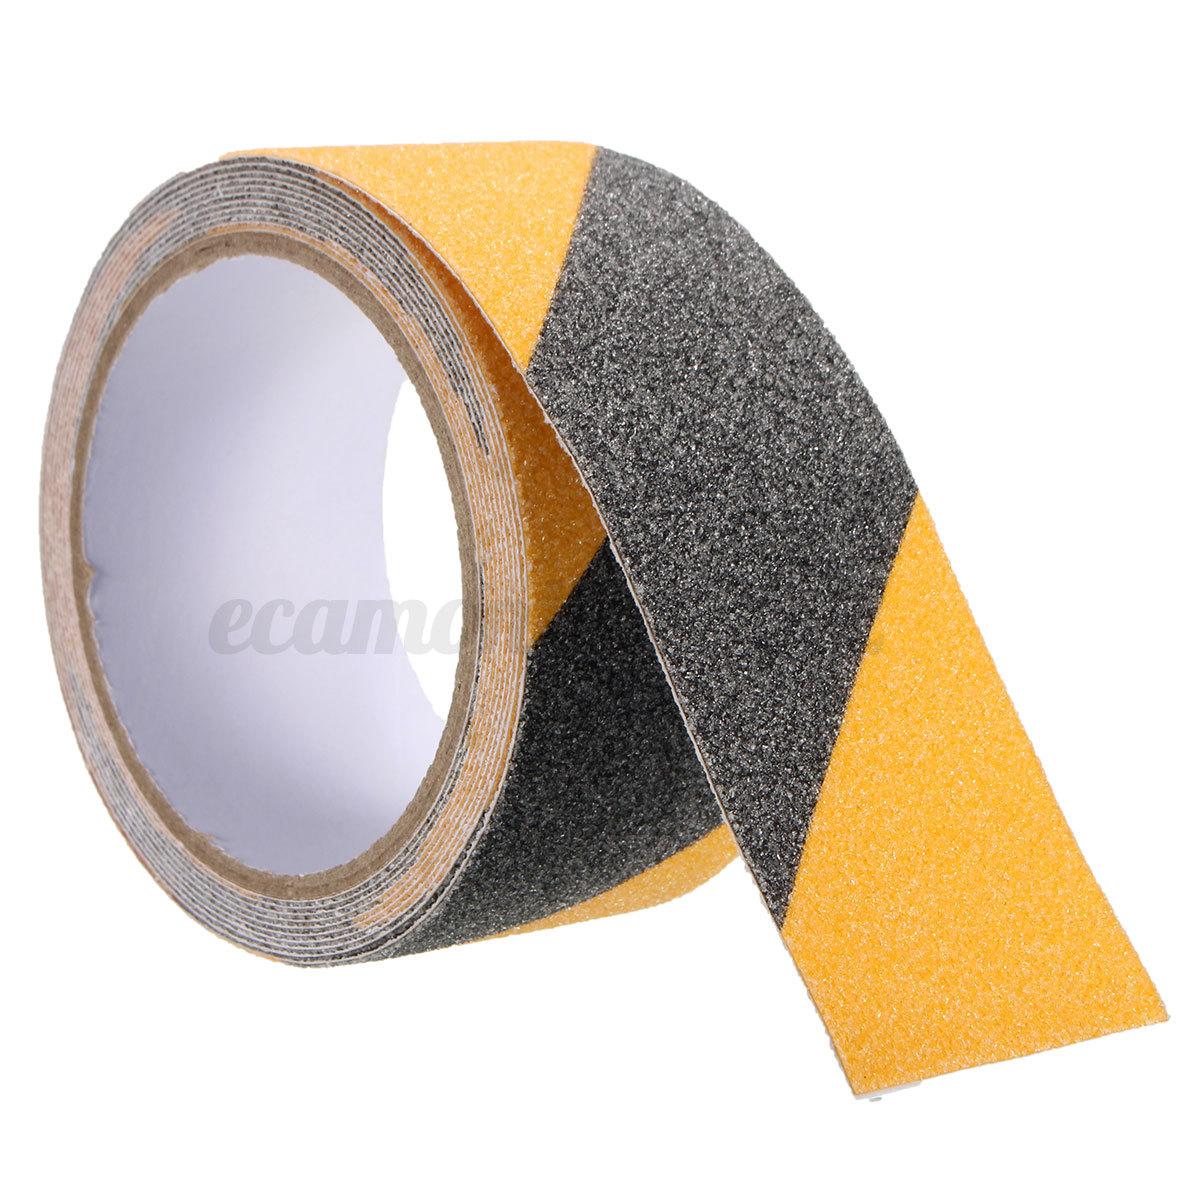 Anti Slip Floor Grips : Cm m anti slip non skid tape high grip adhesive stripe